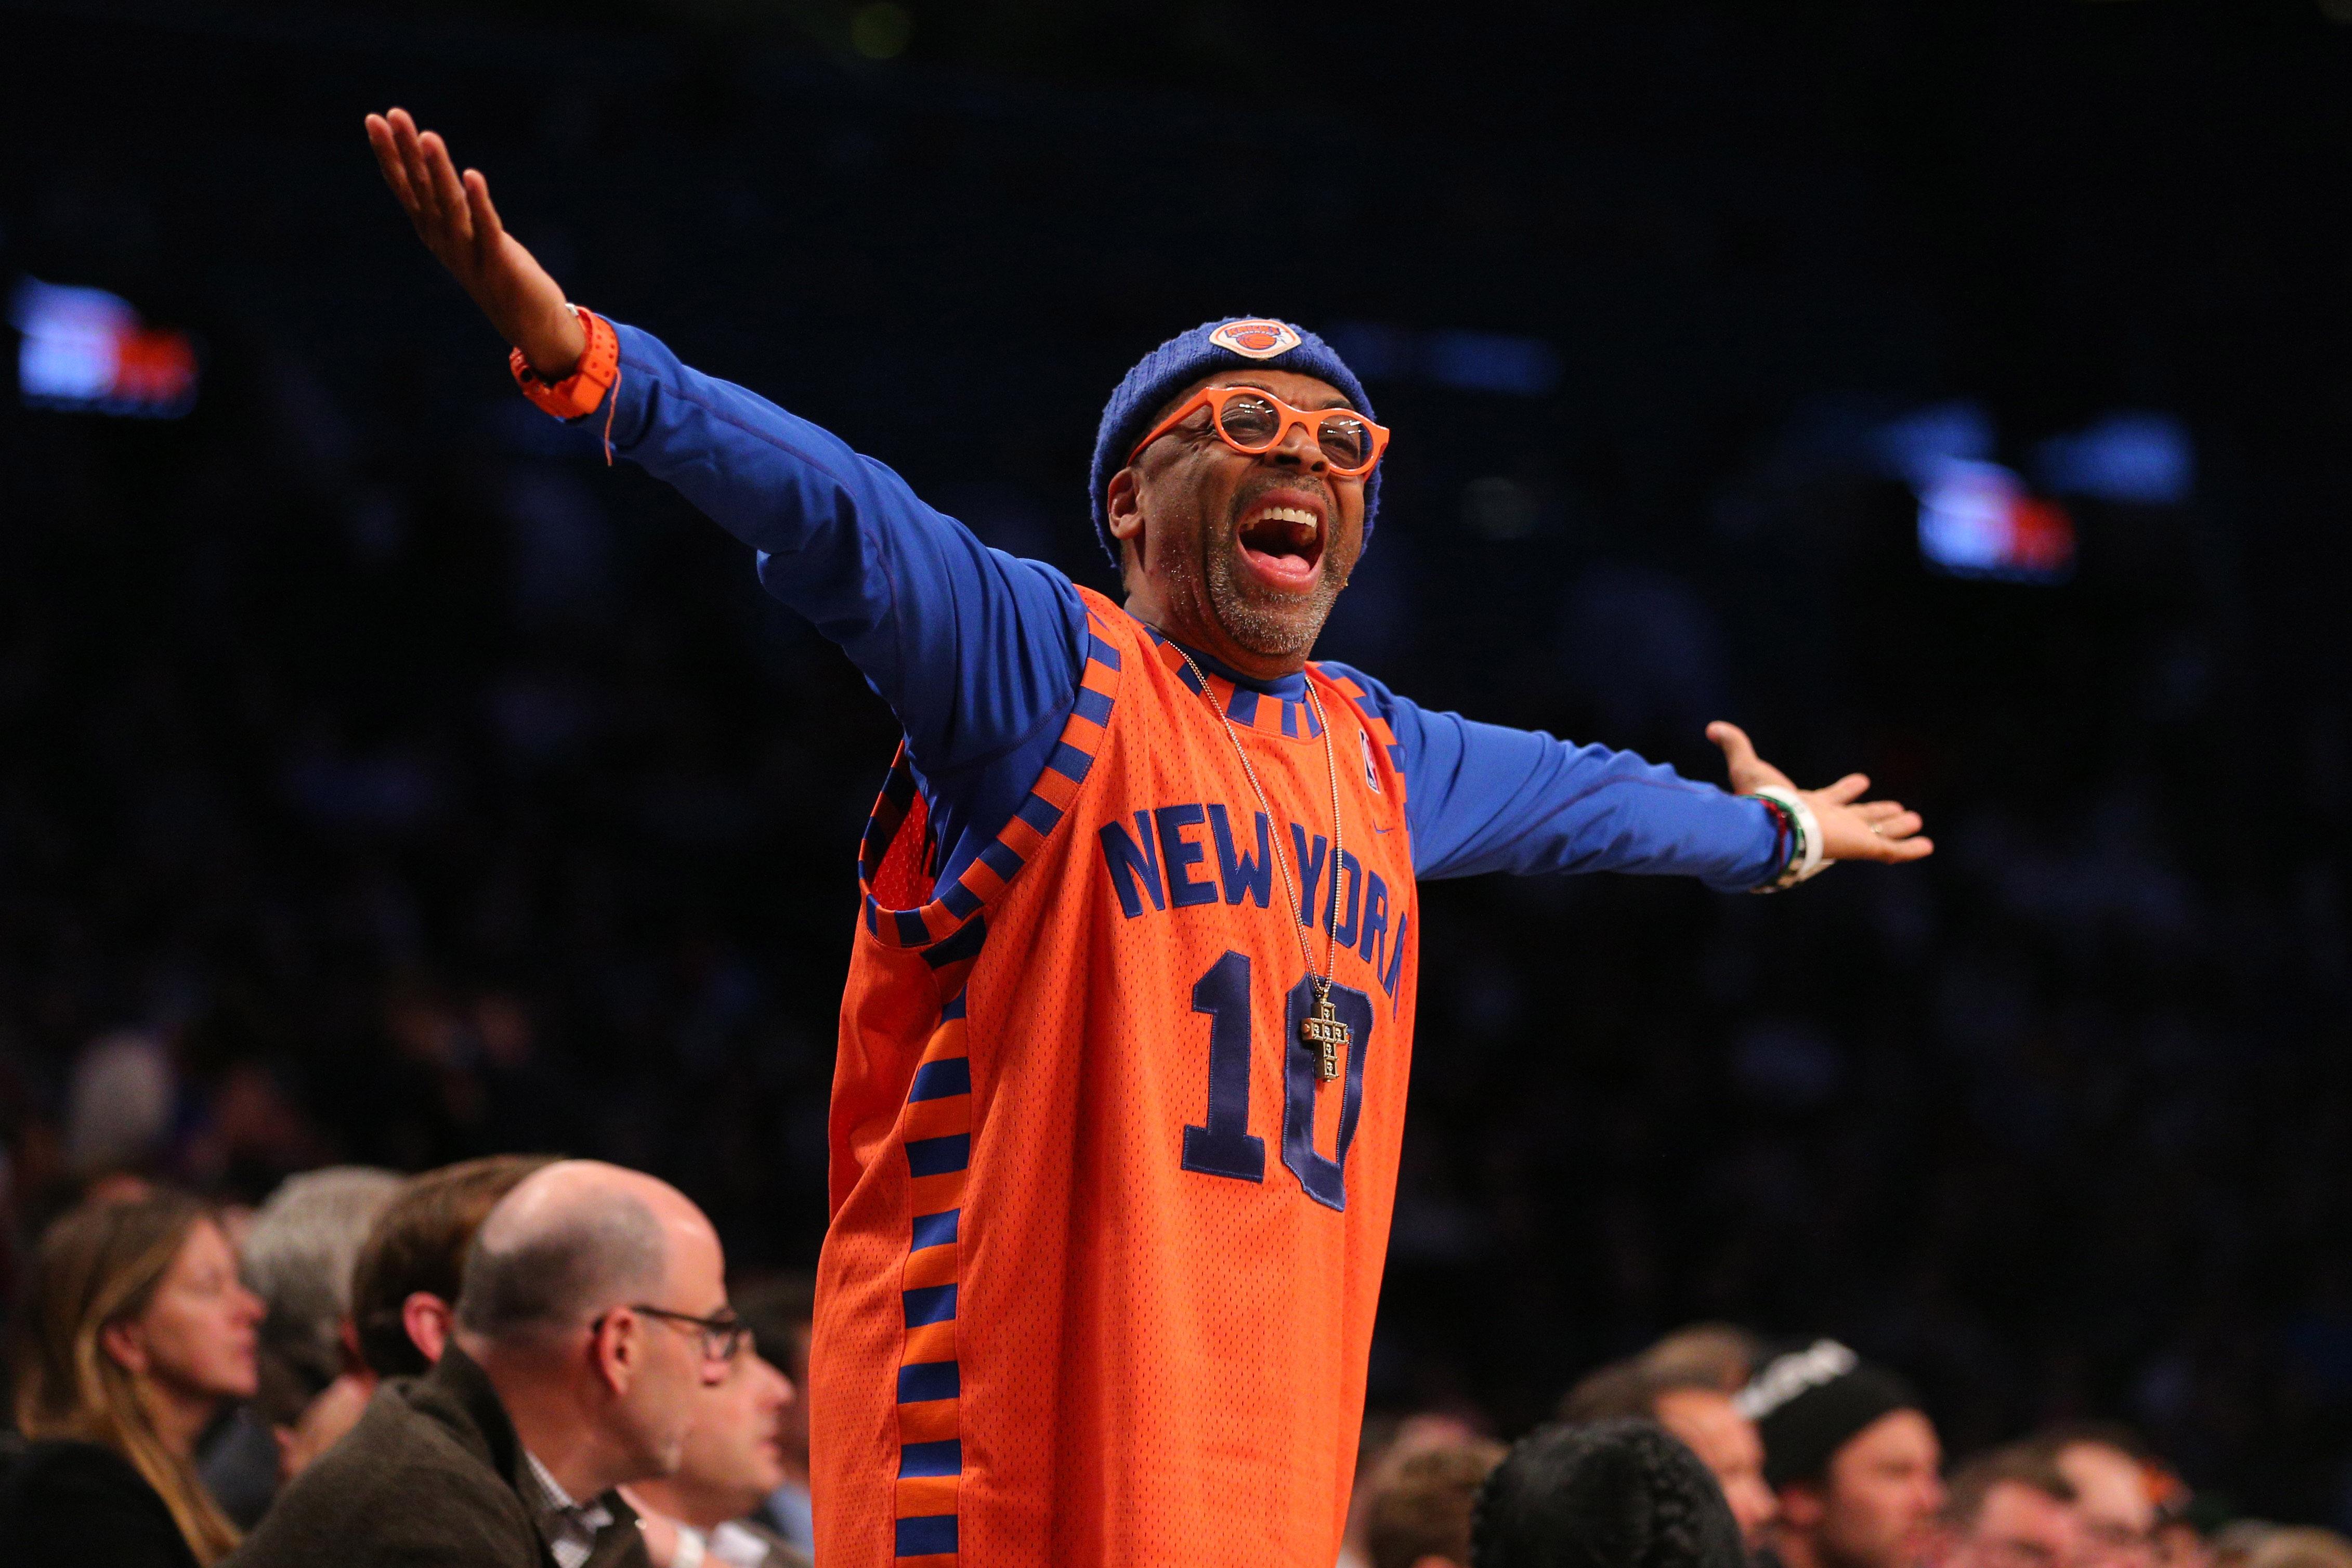 New York Knicks: New York Knicks: Spike Lee Will 'Pack Bags For' Phil Jackson